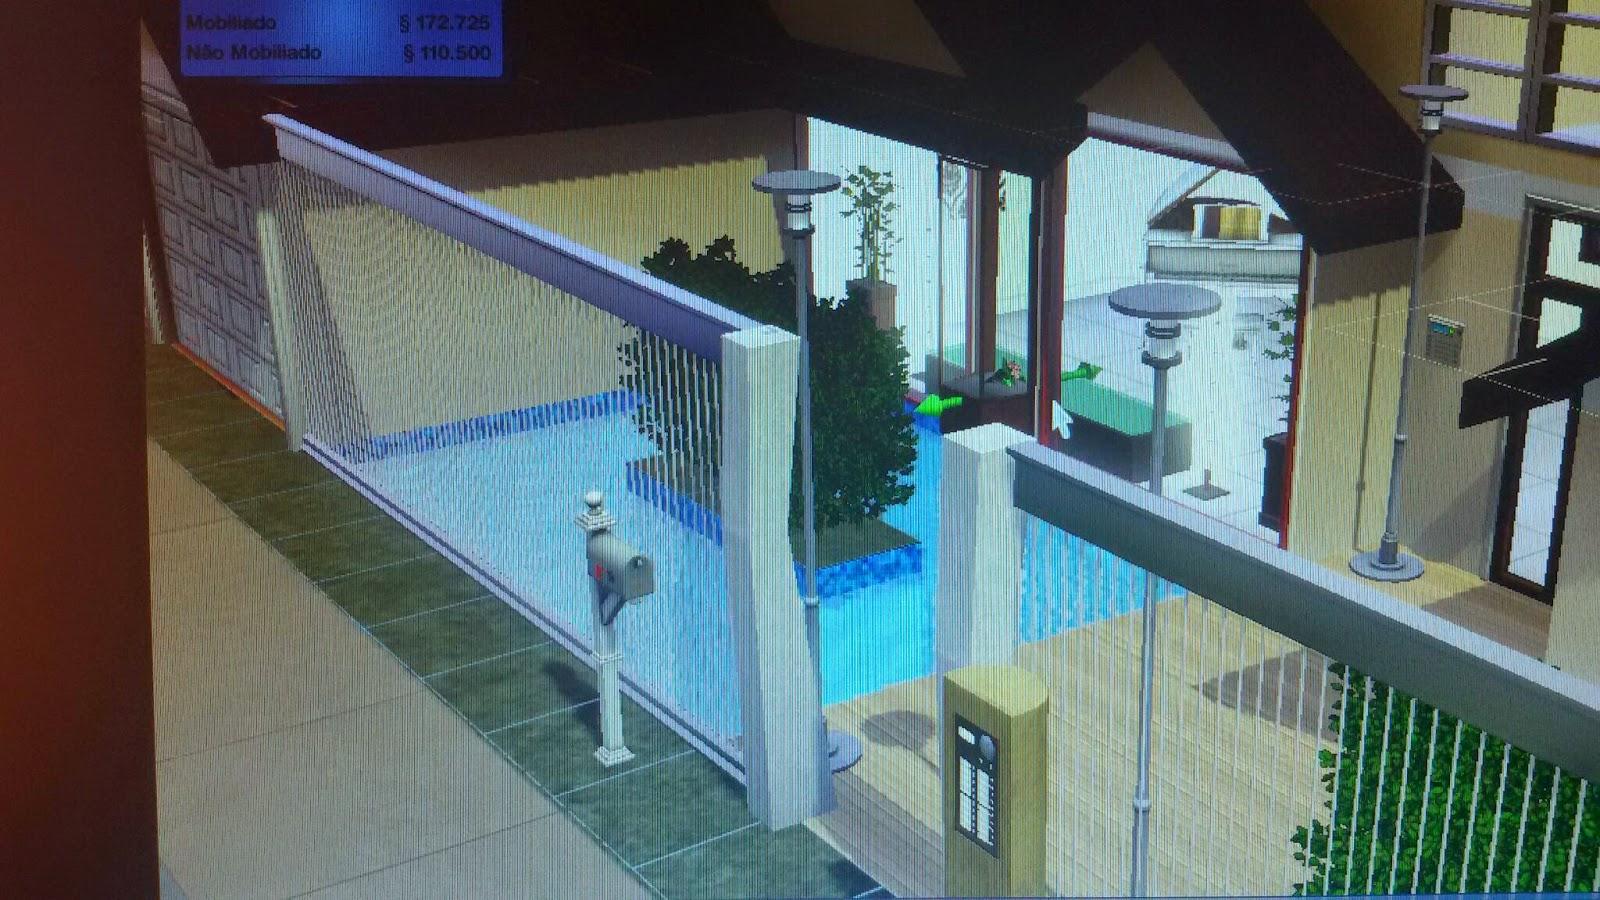 Njr arquitetura casa the sims 3 for Casa moderna los sims 3